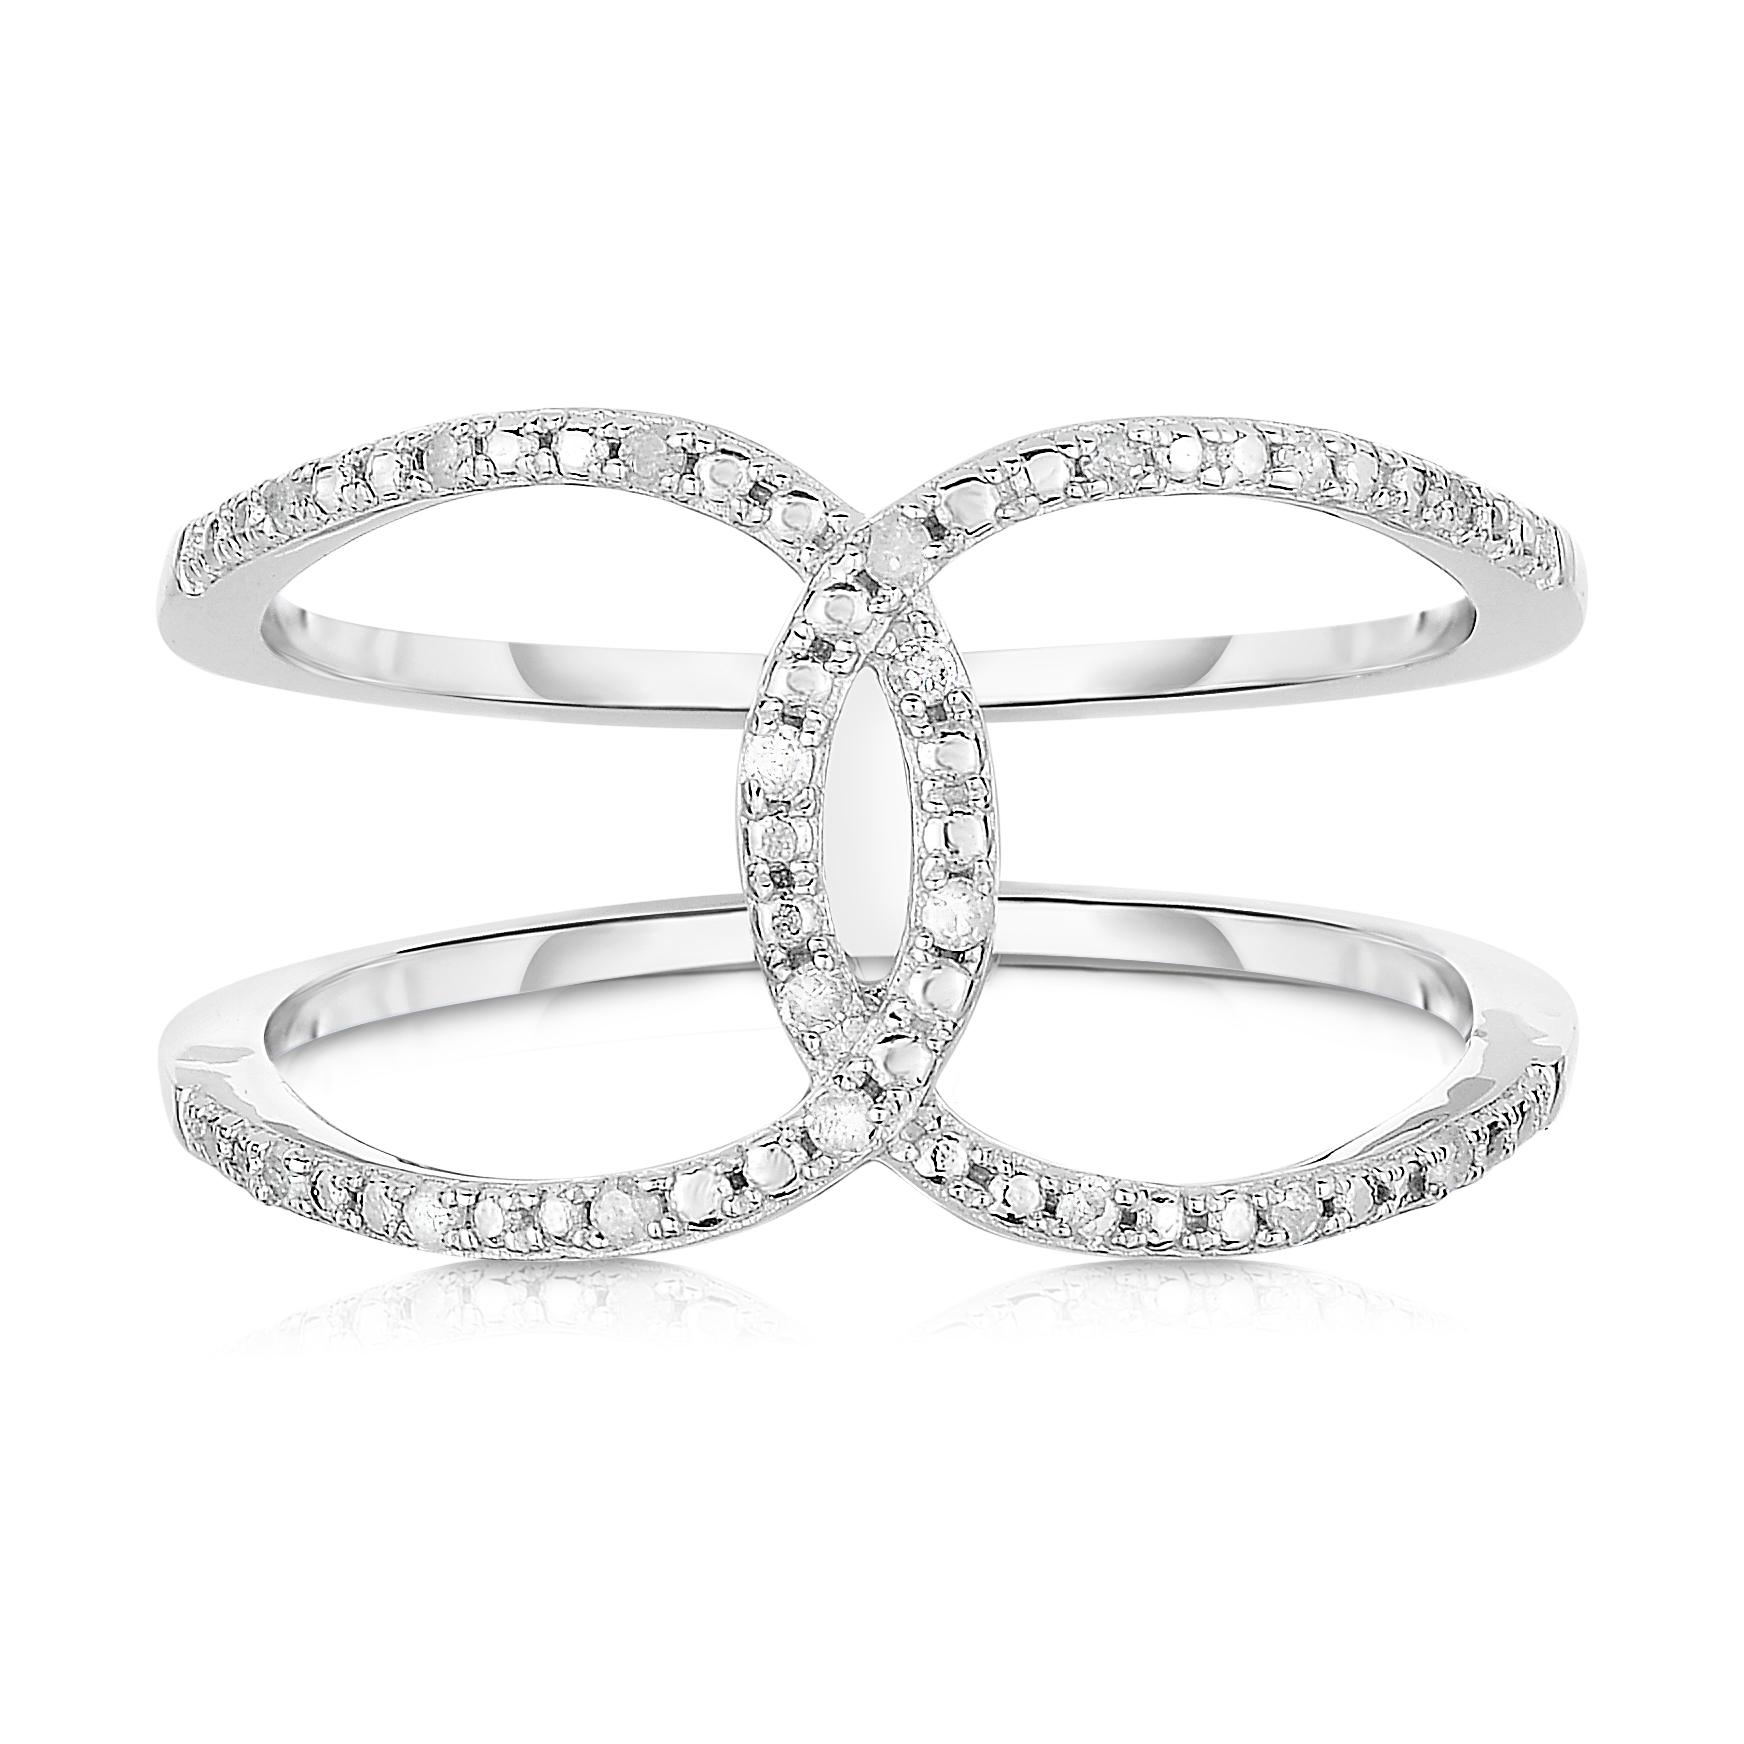 Sears Jewelry Rings Style Guru Fashion Glitz Glamour